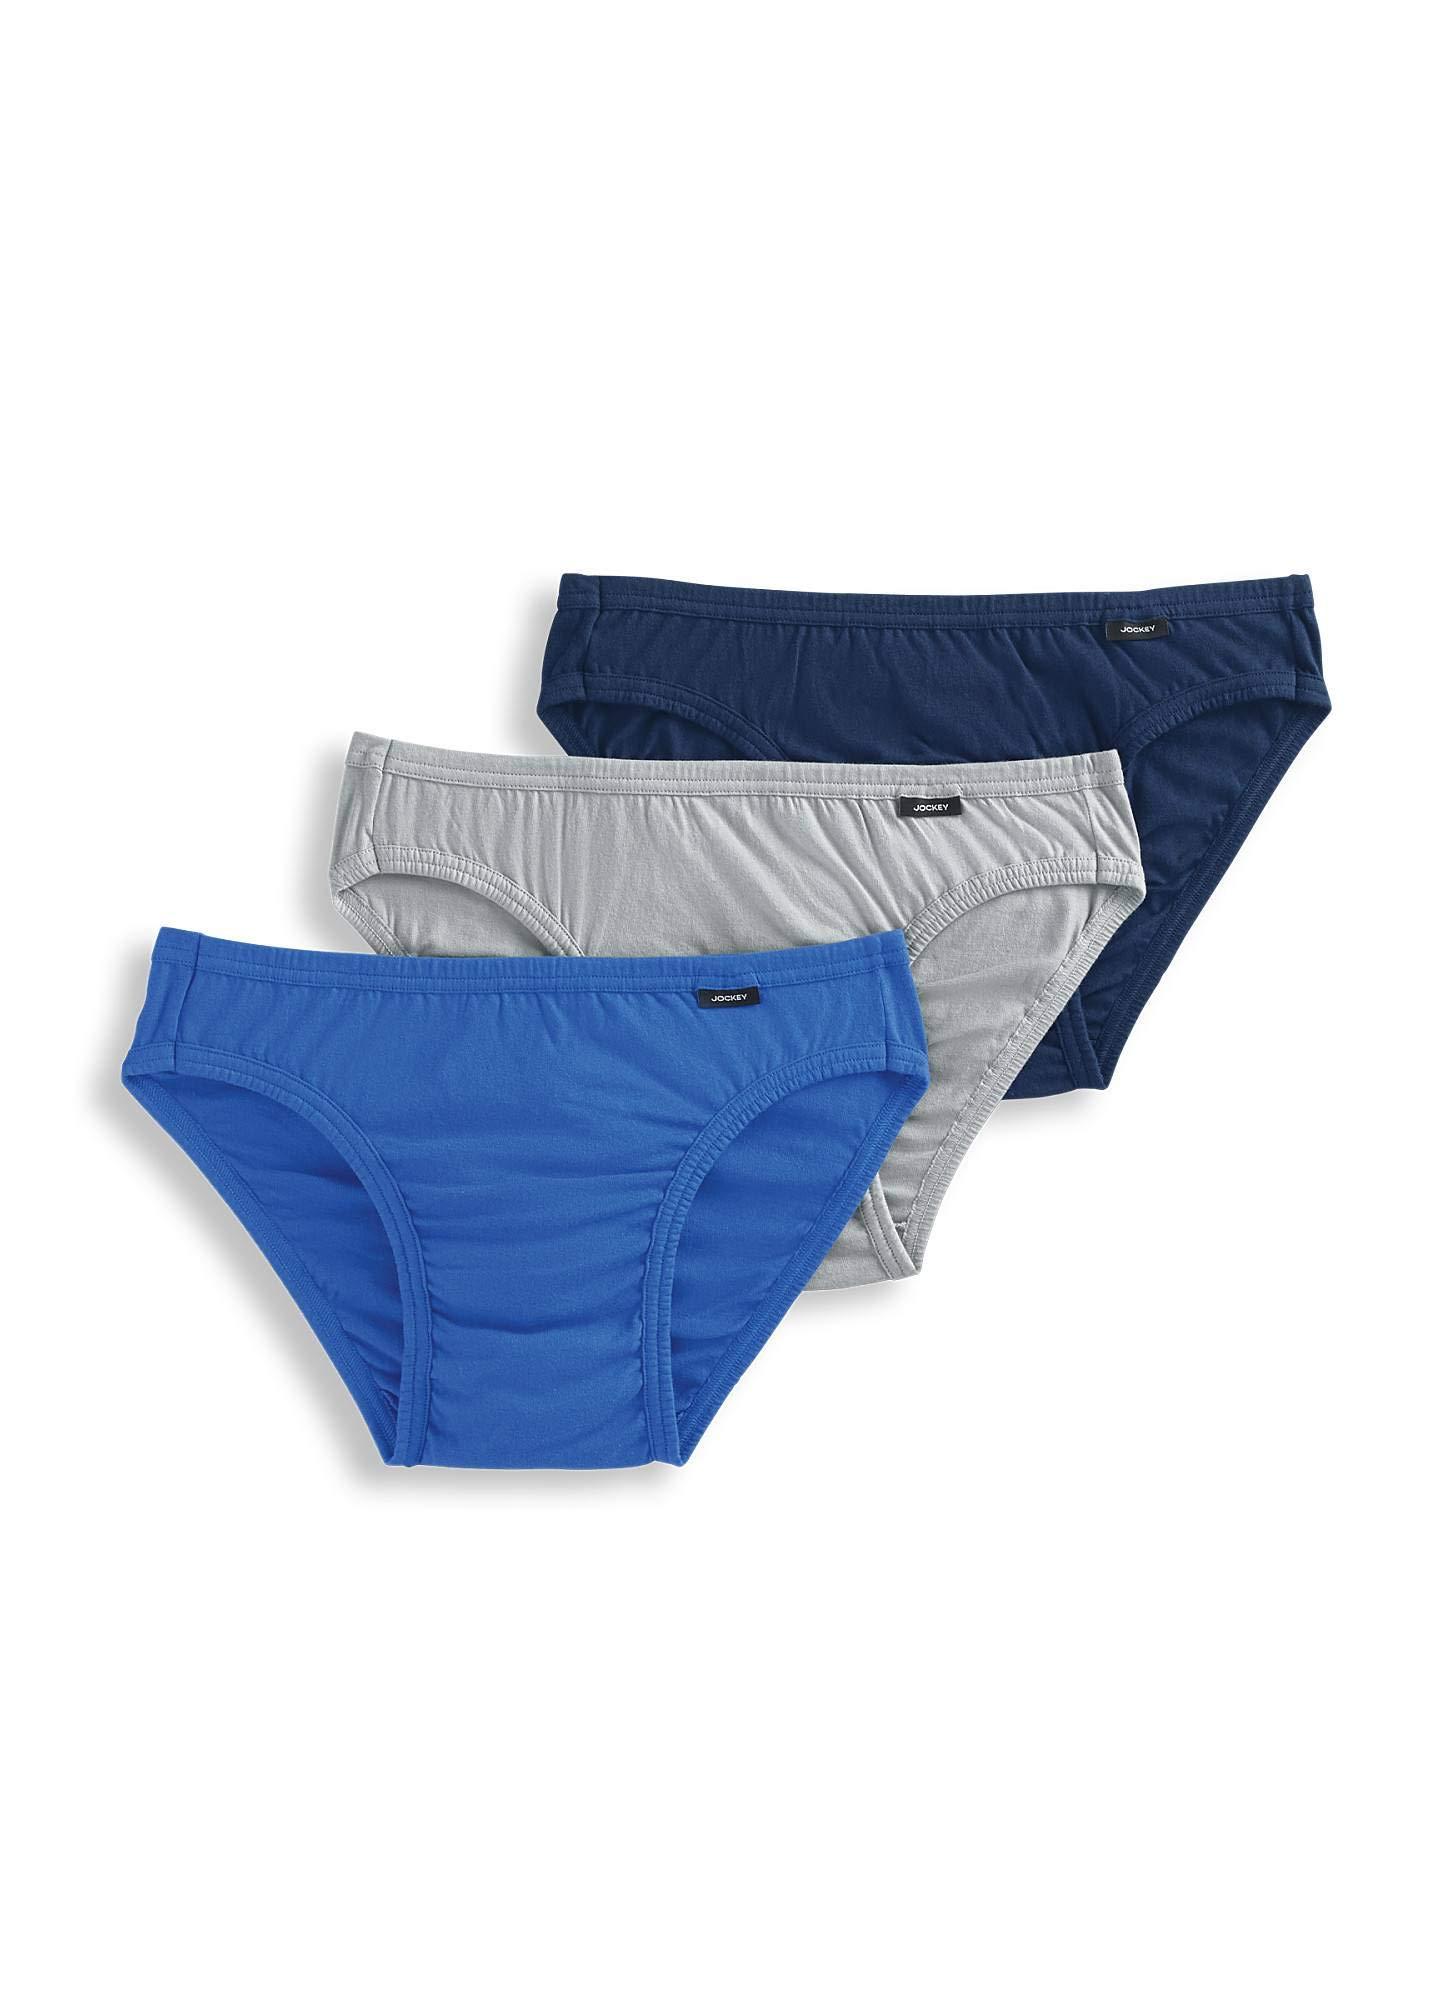 fcd2abf4b6837 Best Rated in Men s Bikini Underwear   Helpful Customer Reviews ...